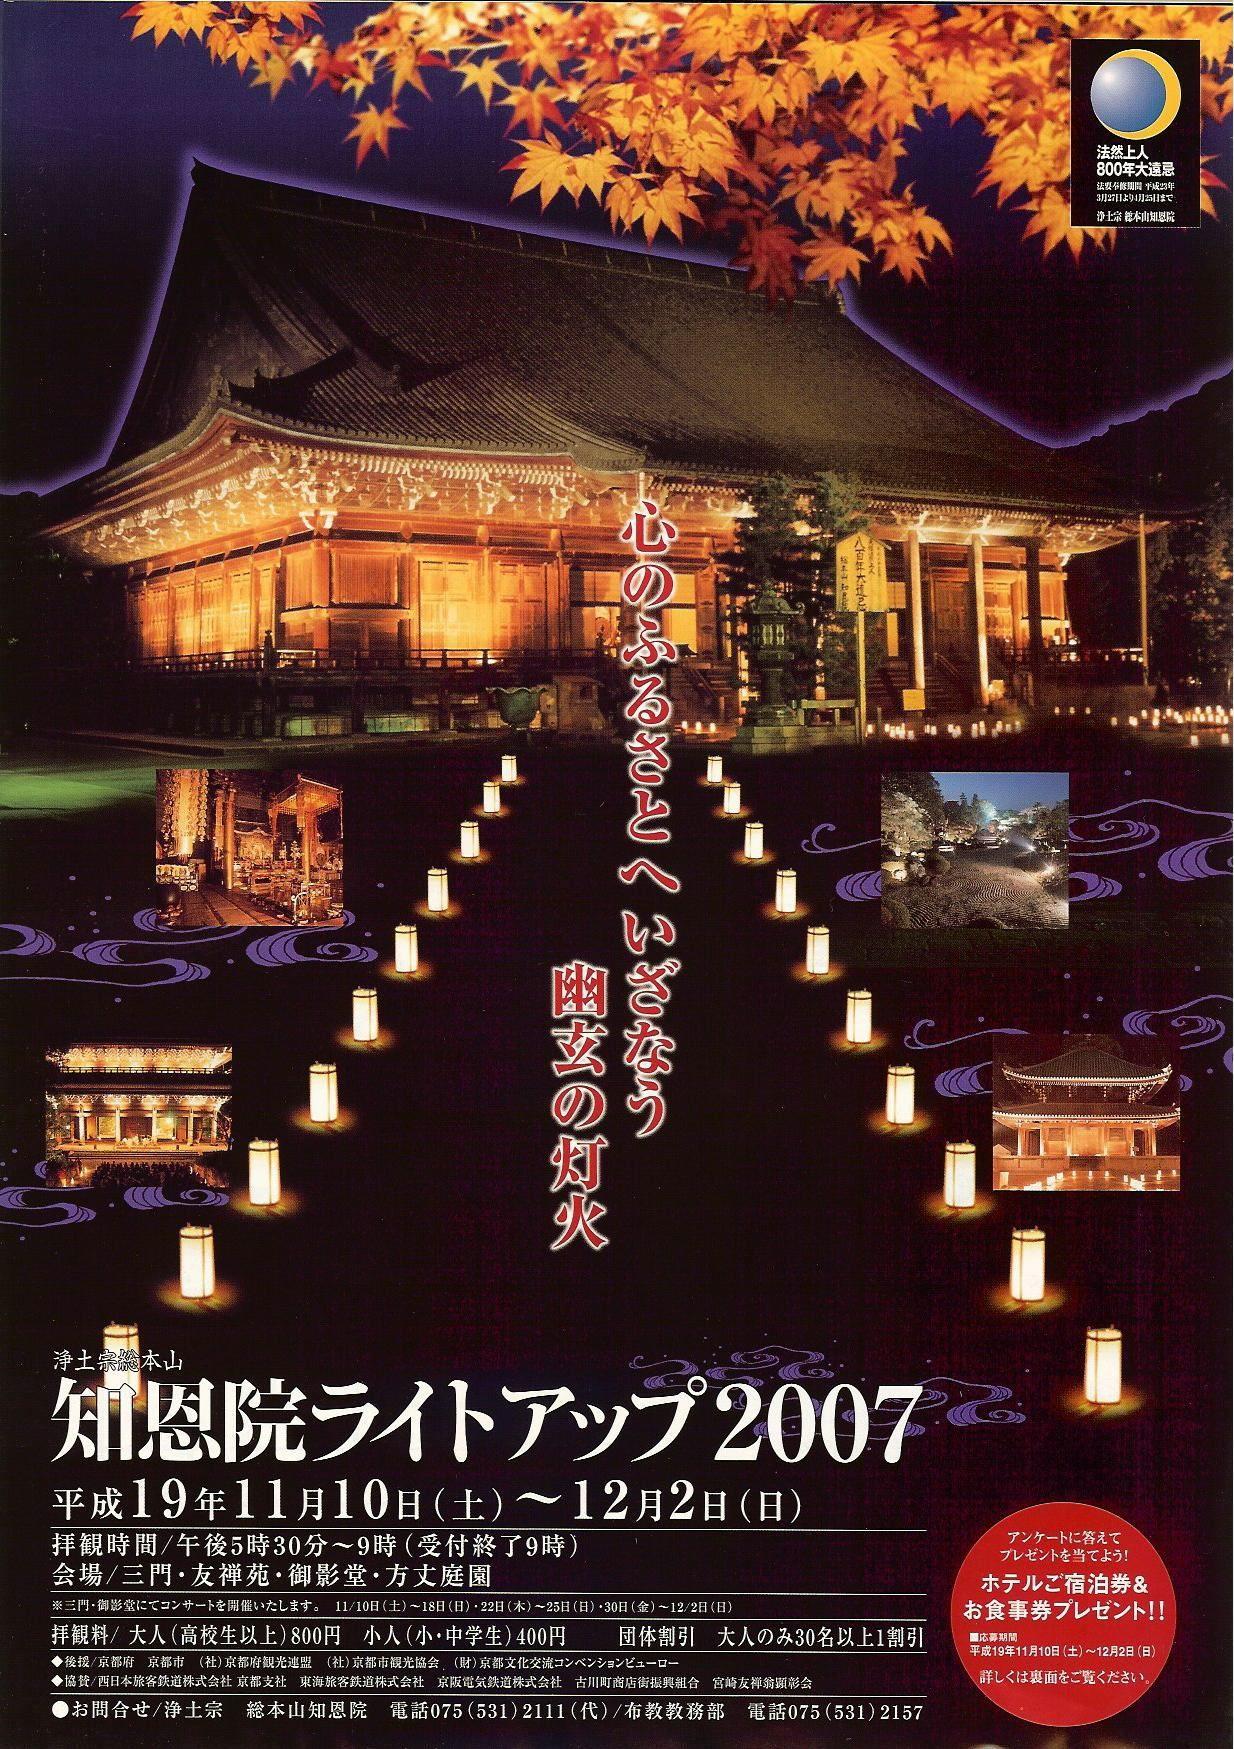 Kyoto 知恩院ライトアップ